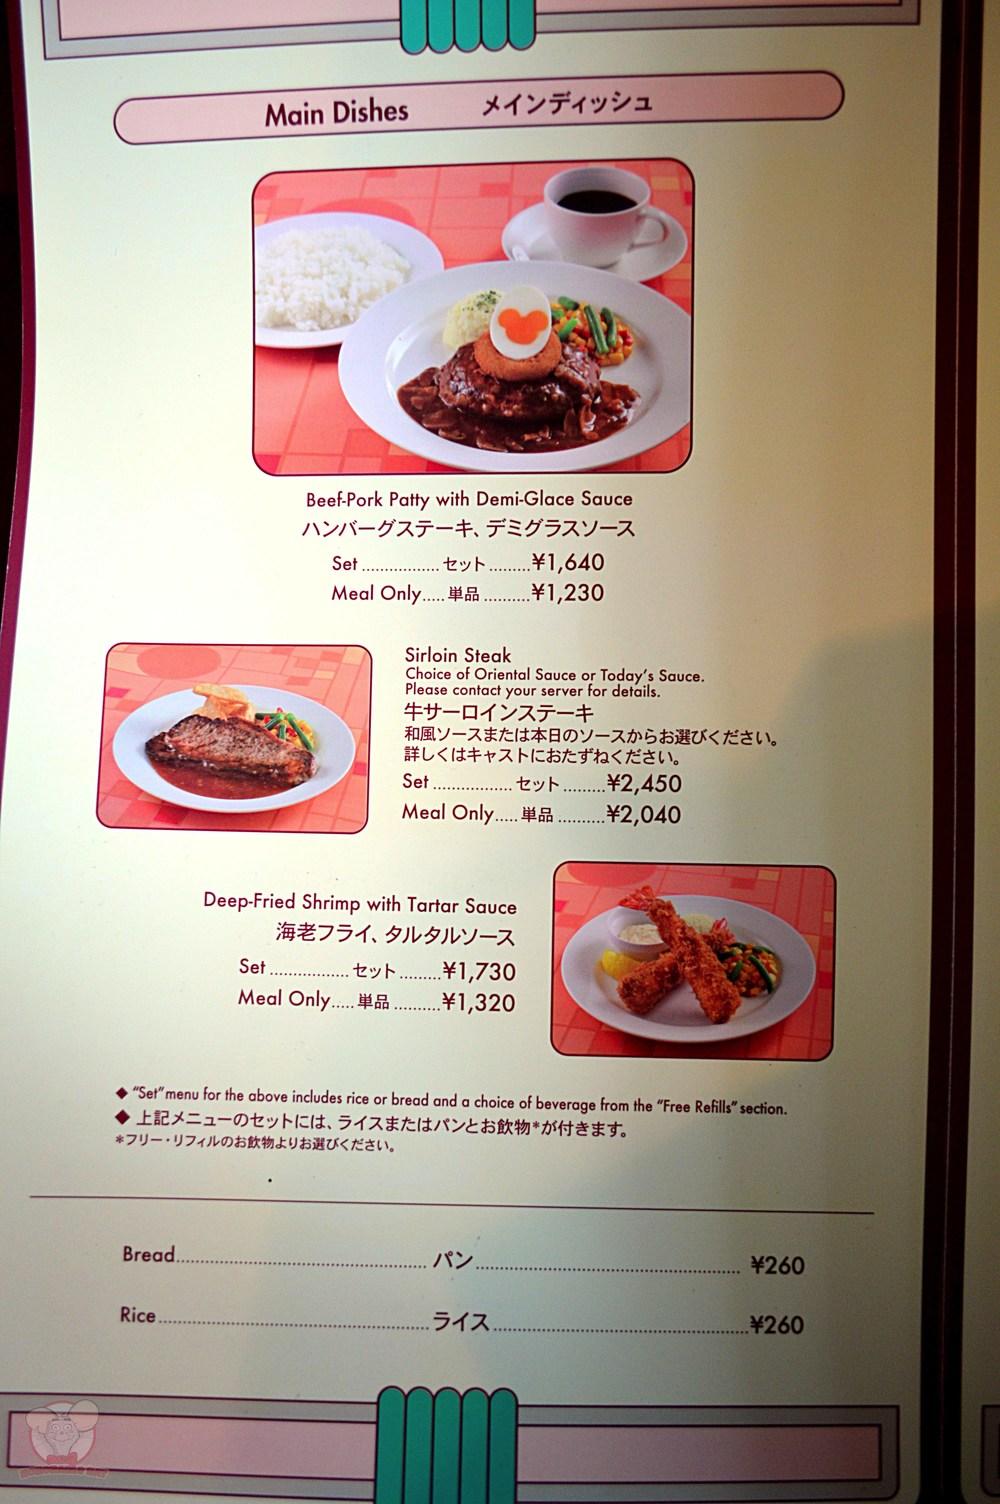 Center Street Coffeehouse Menu, Main Dishes (B)